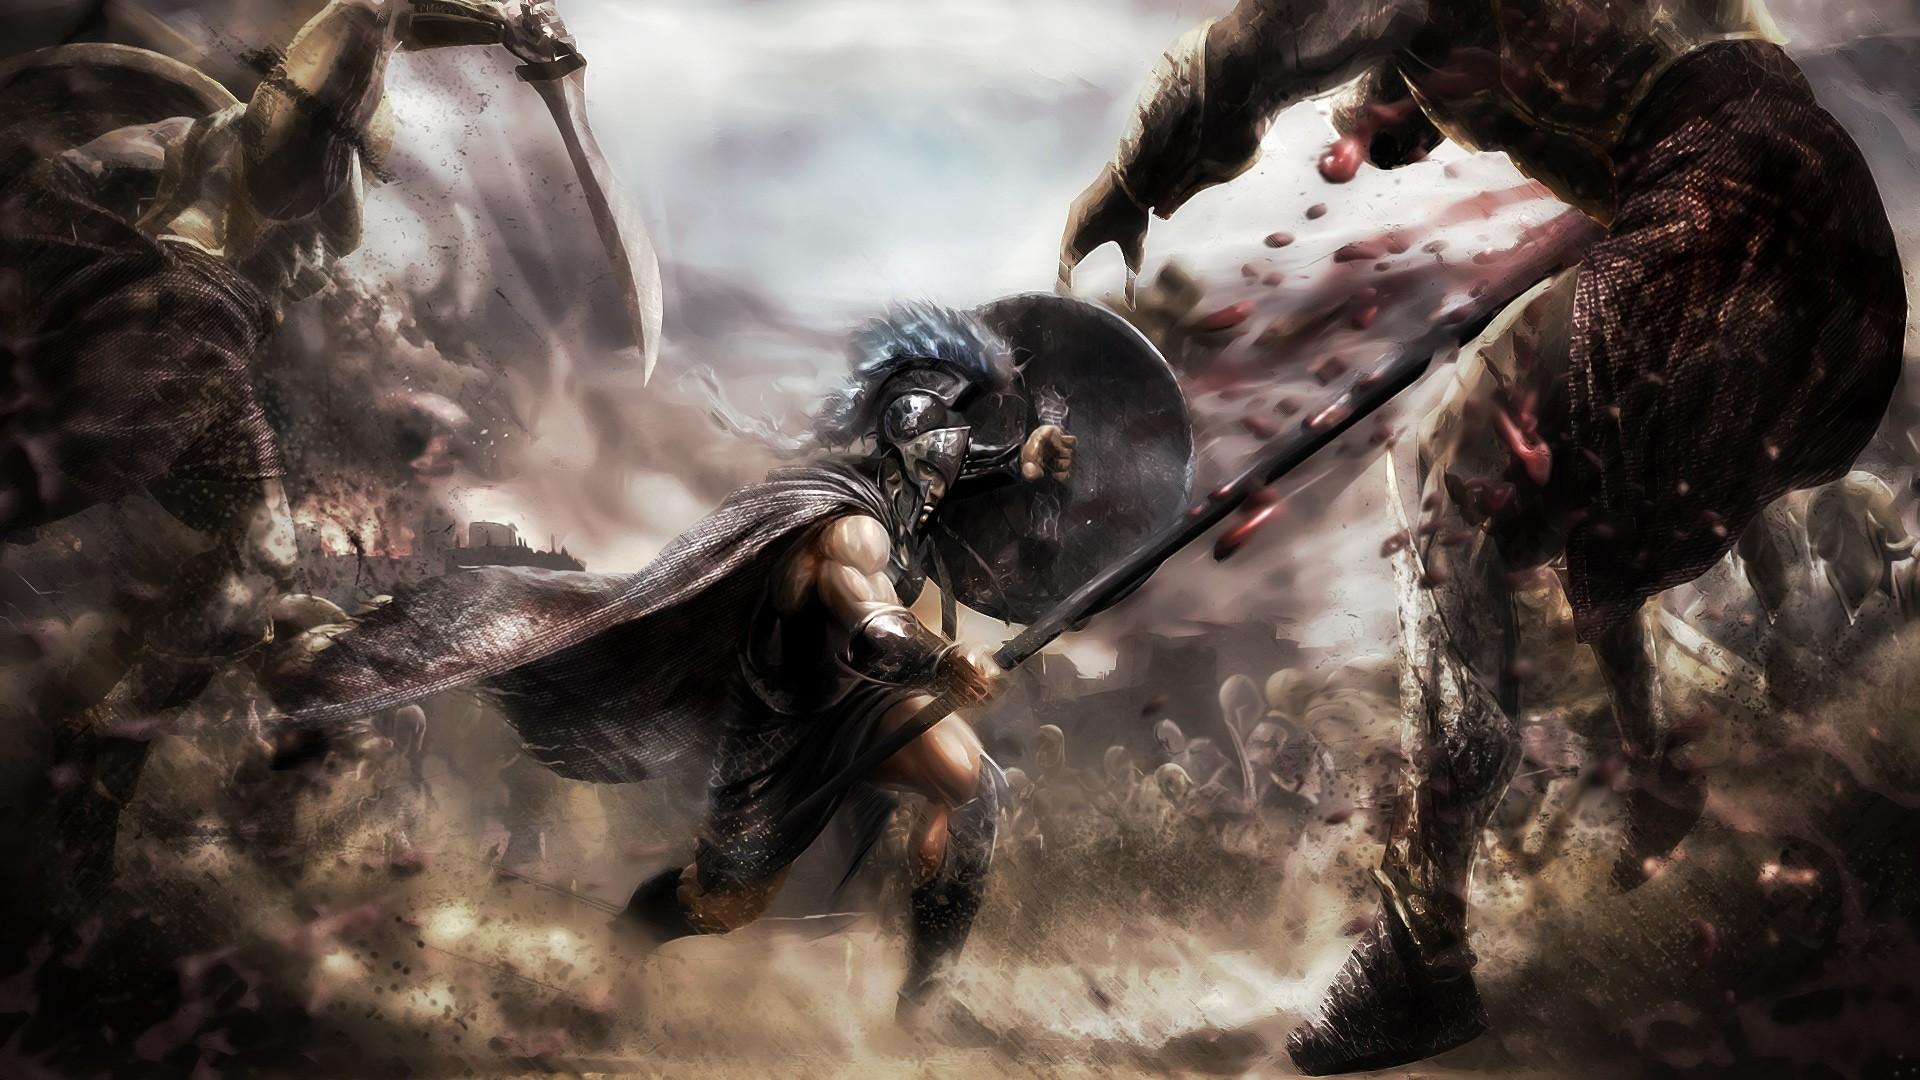 Warrior Wallpapers Full HD p Best HD Warrior Pics